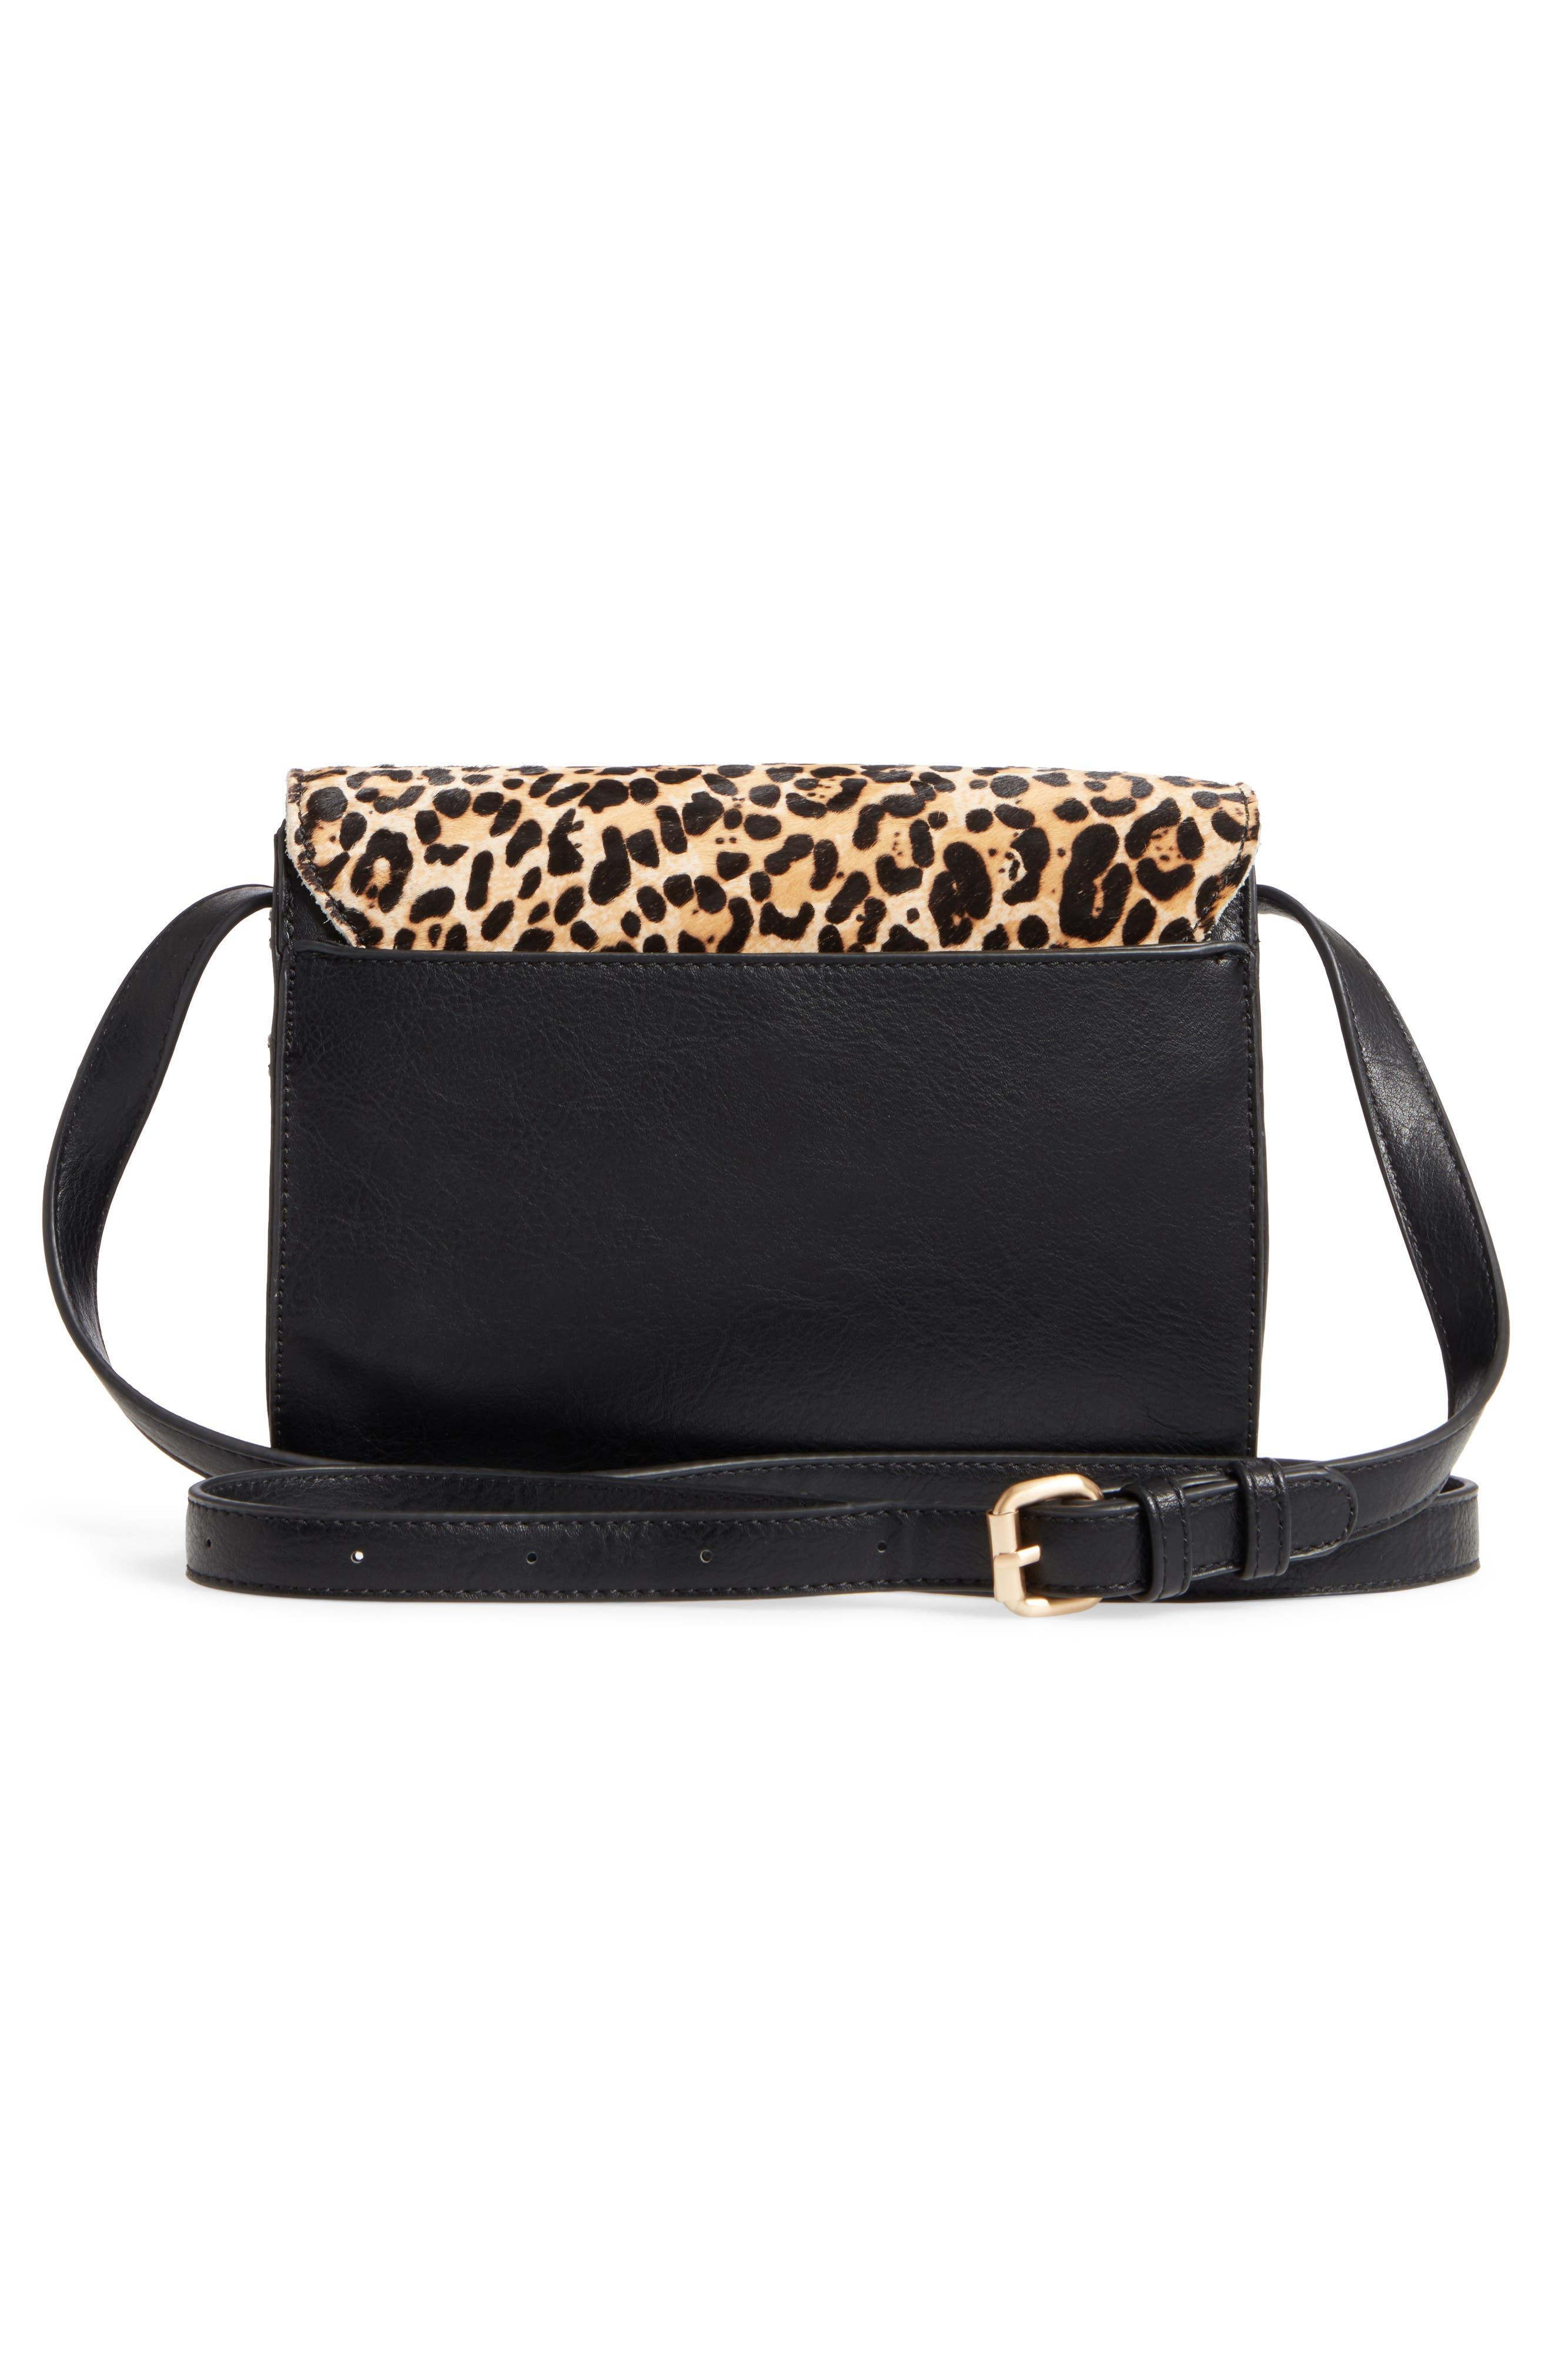 Alternate Image 3  - Sole Society Michelle Genuine Calf Hair Flap Crossbody Bag